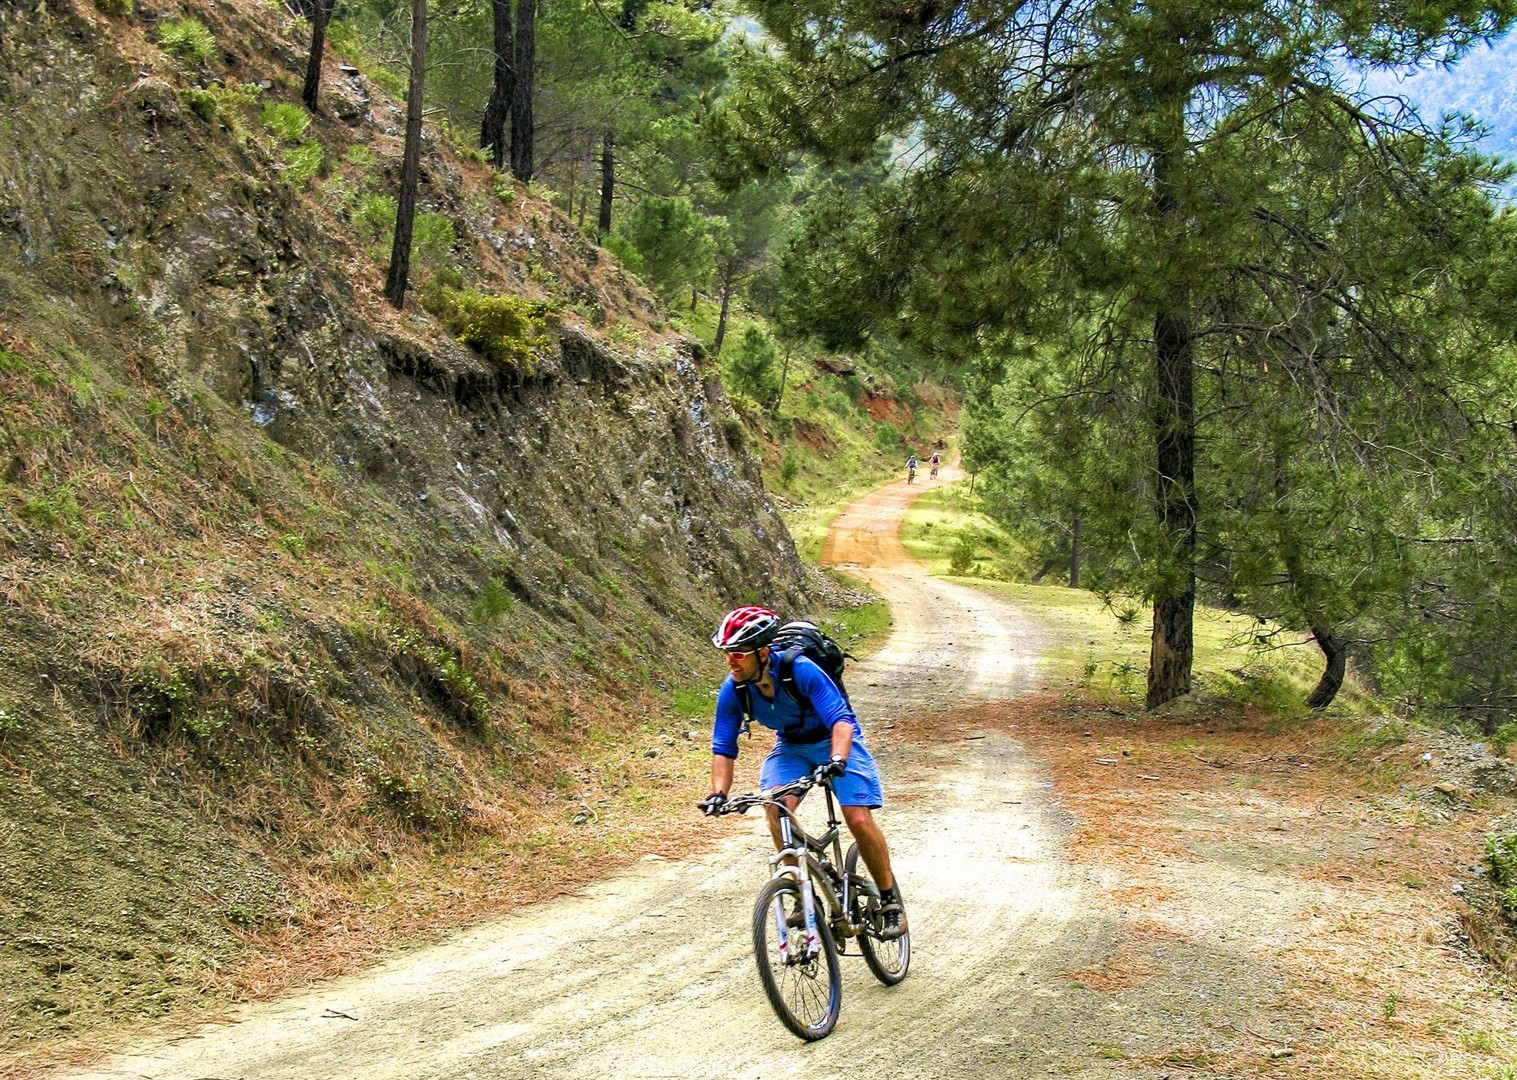 _Holiday.660.9732.jpg - Spain - Ruta de la Plata - Guided Mountain Bike Holiday - Mountain Biking